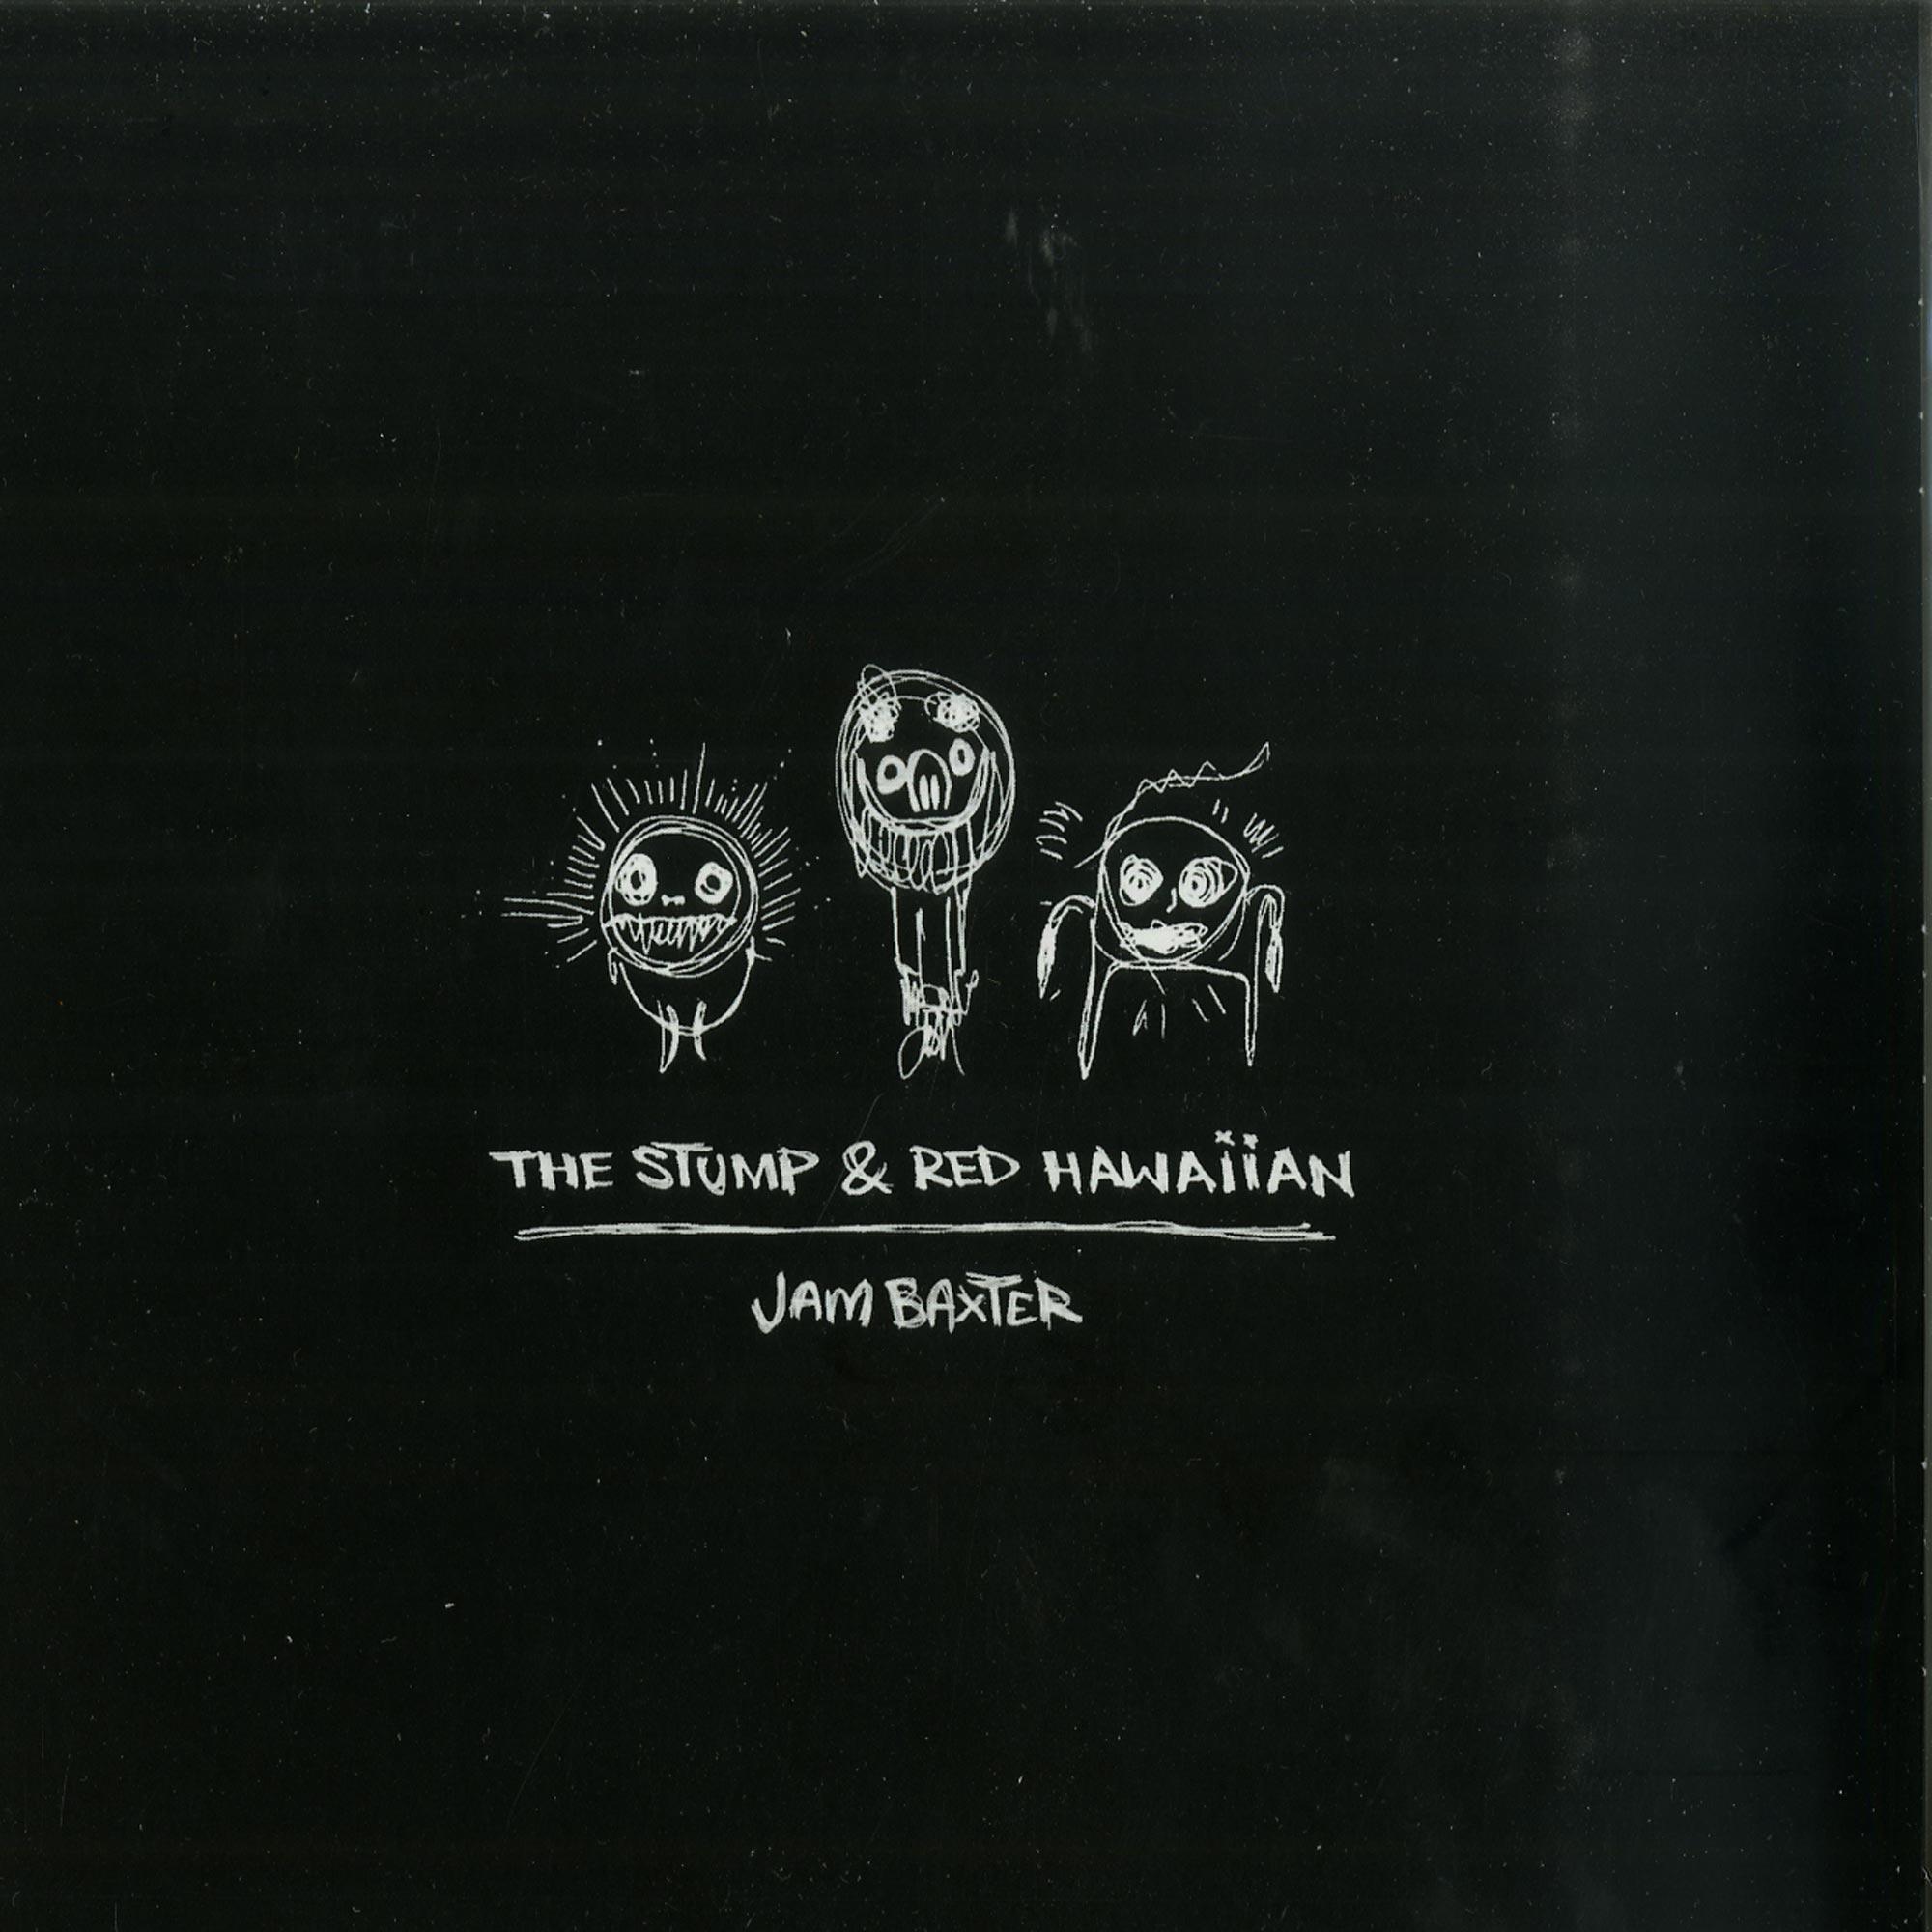 Jam Baxter - THE STUMP & RED HAWAIIAN